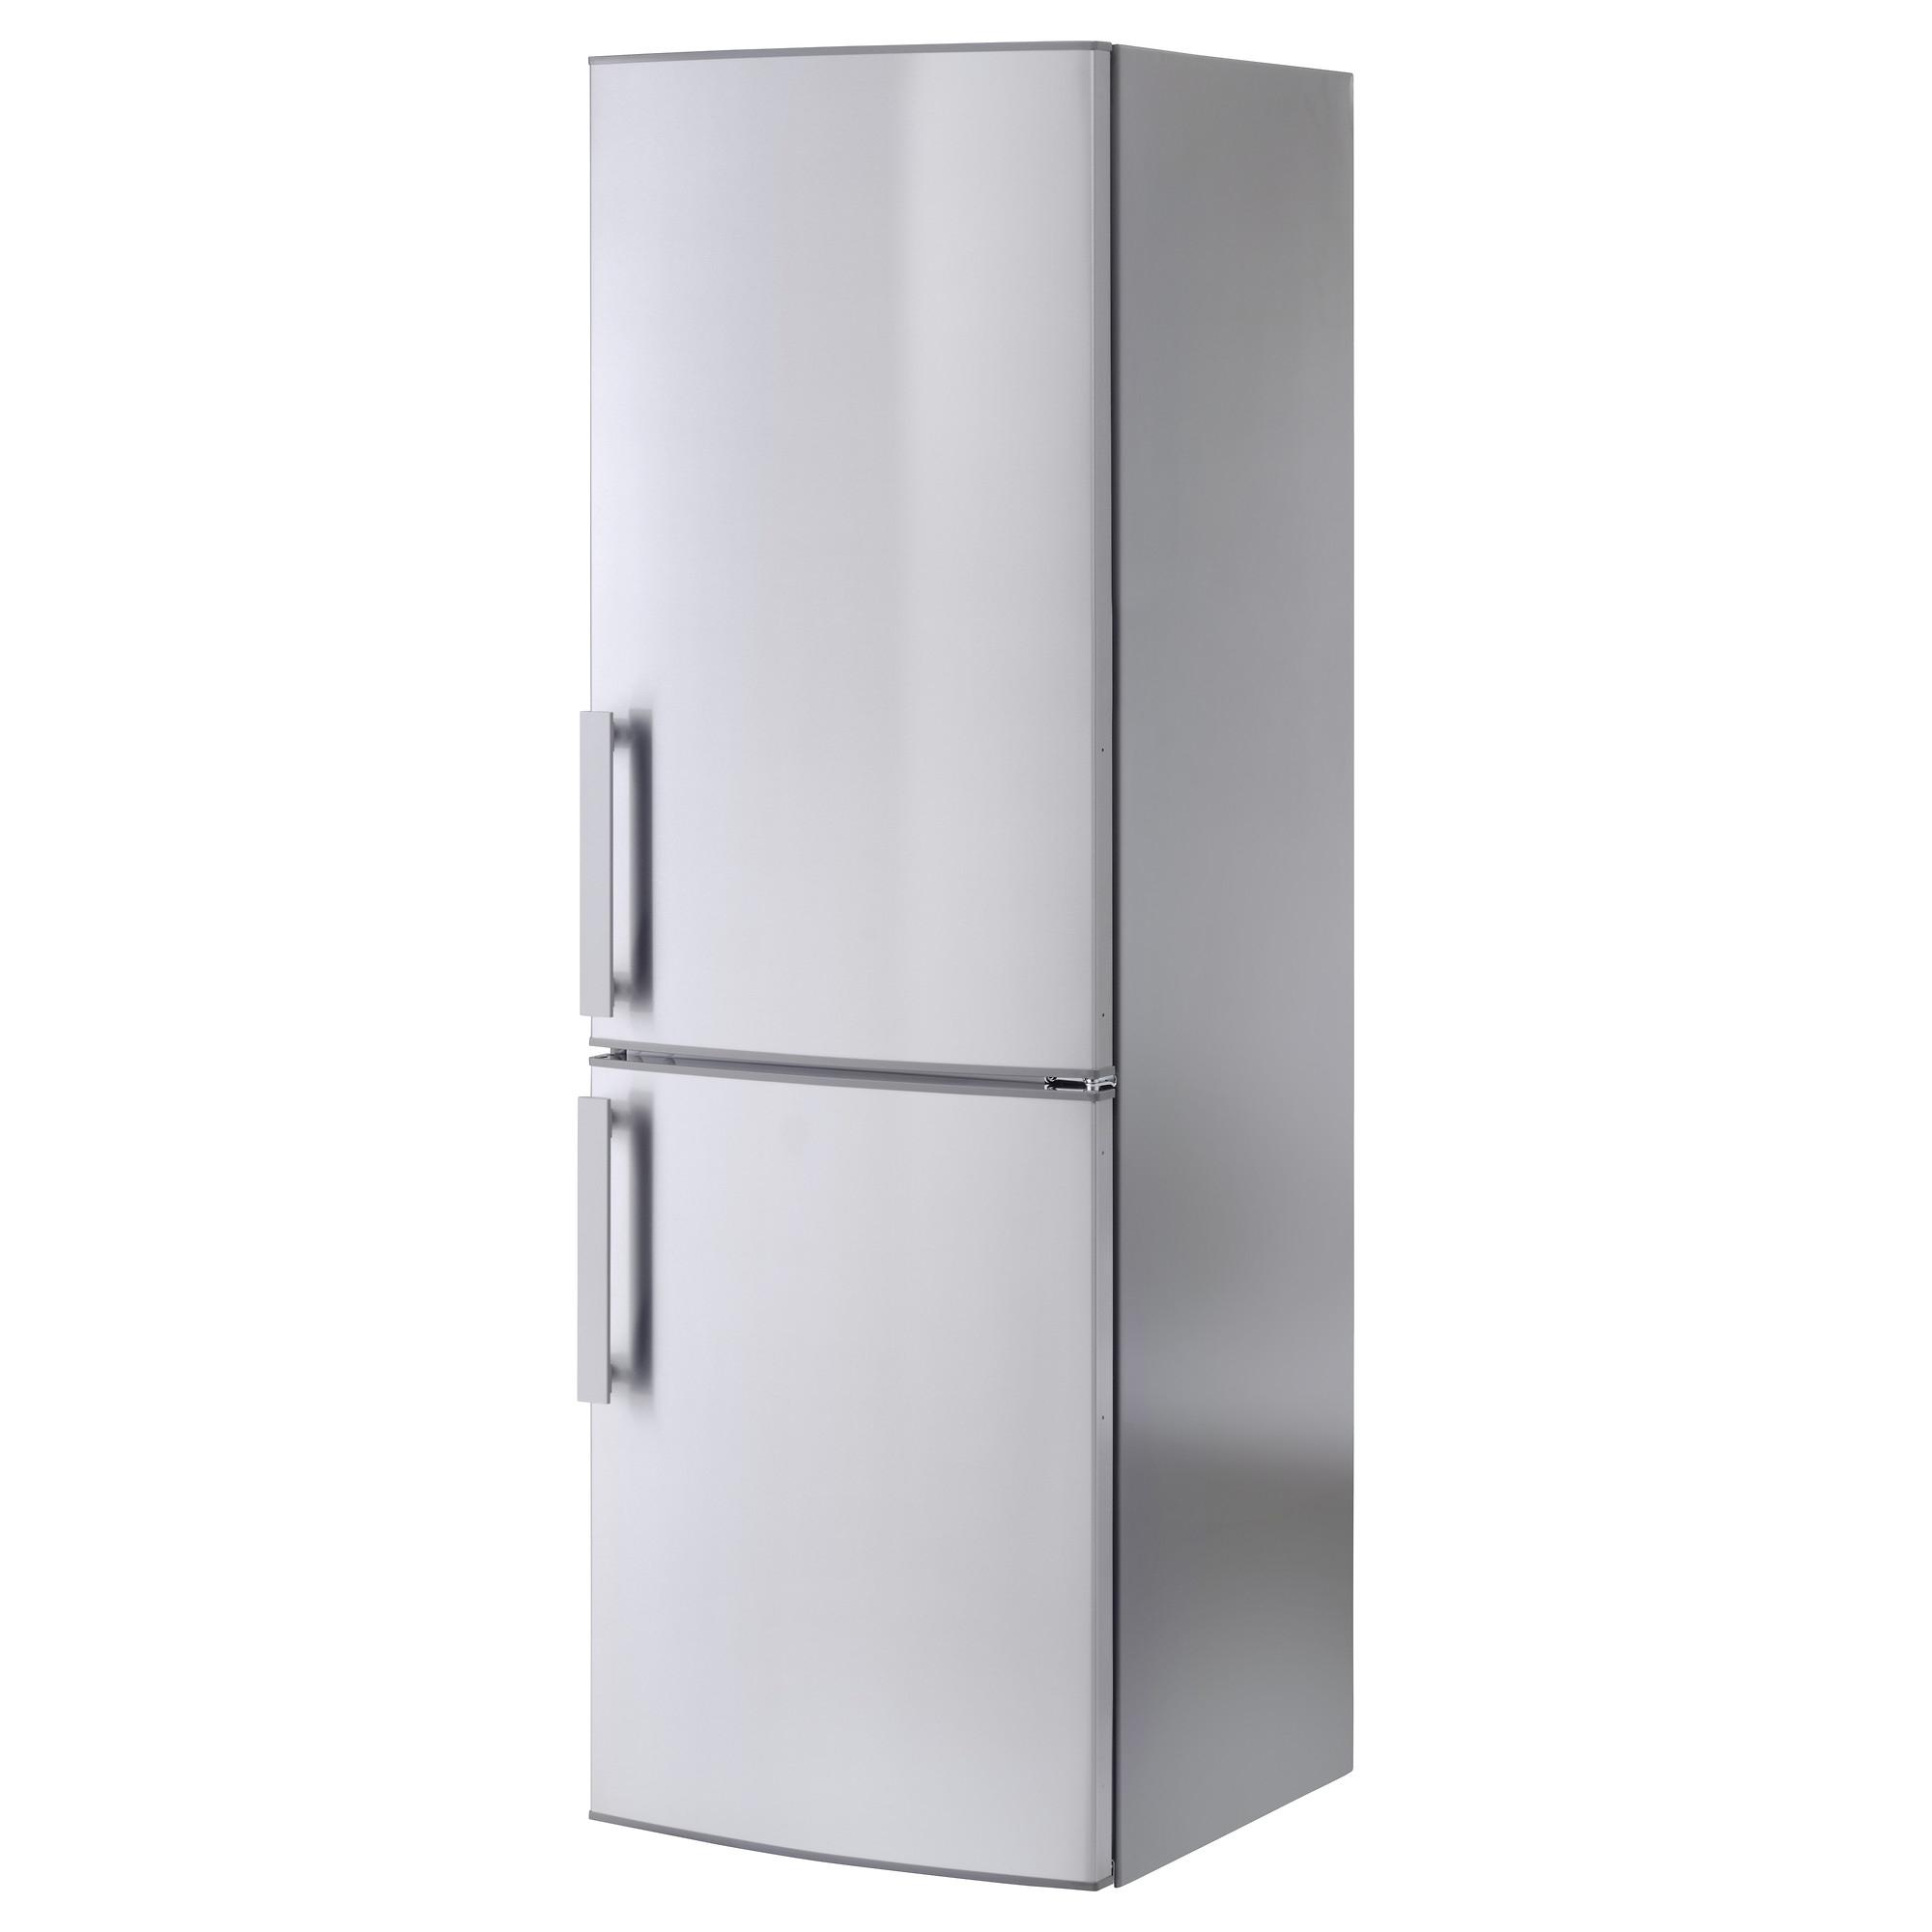 KYLIG frigorífico/congelador A++